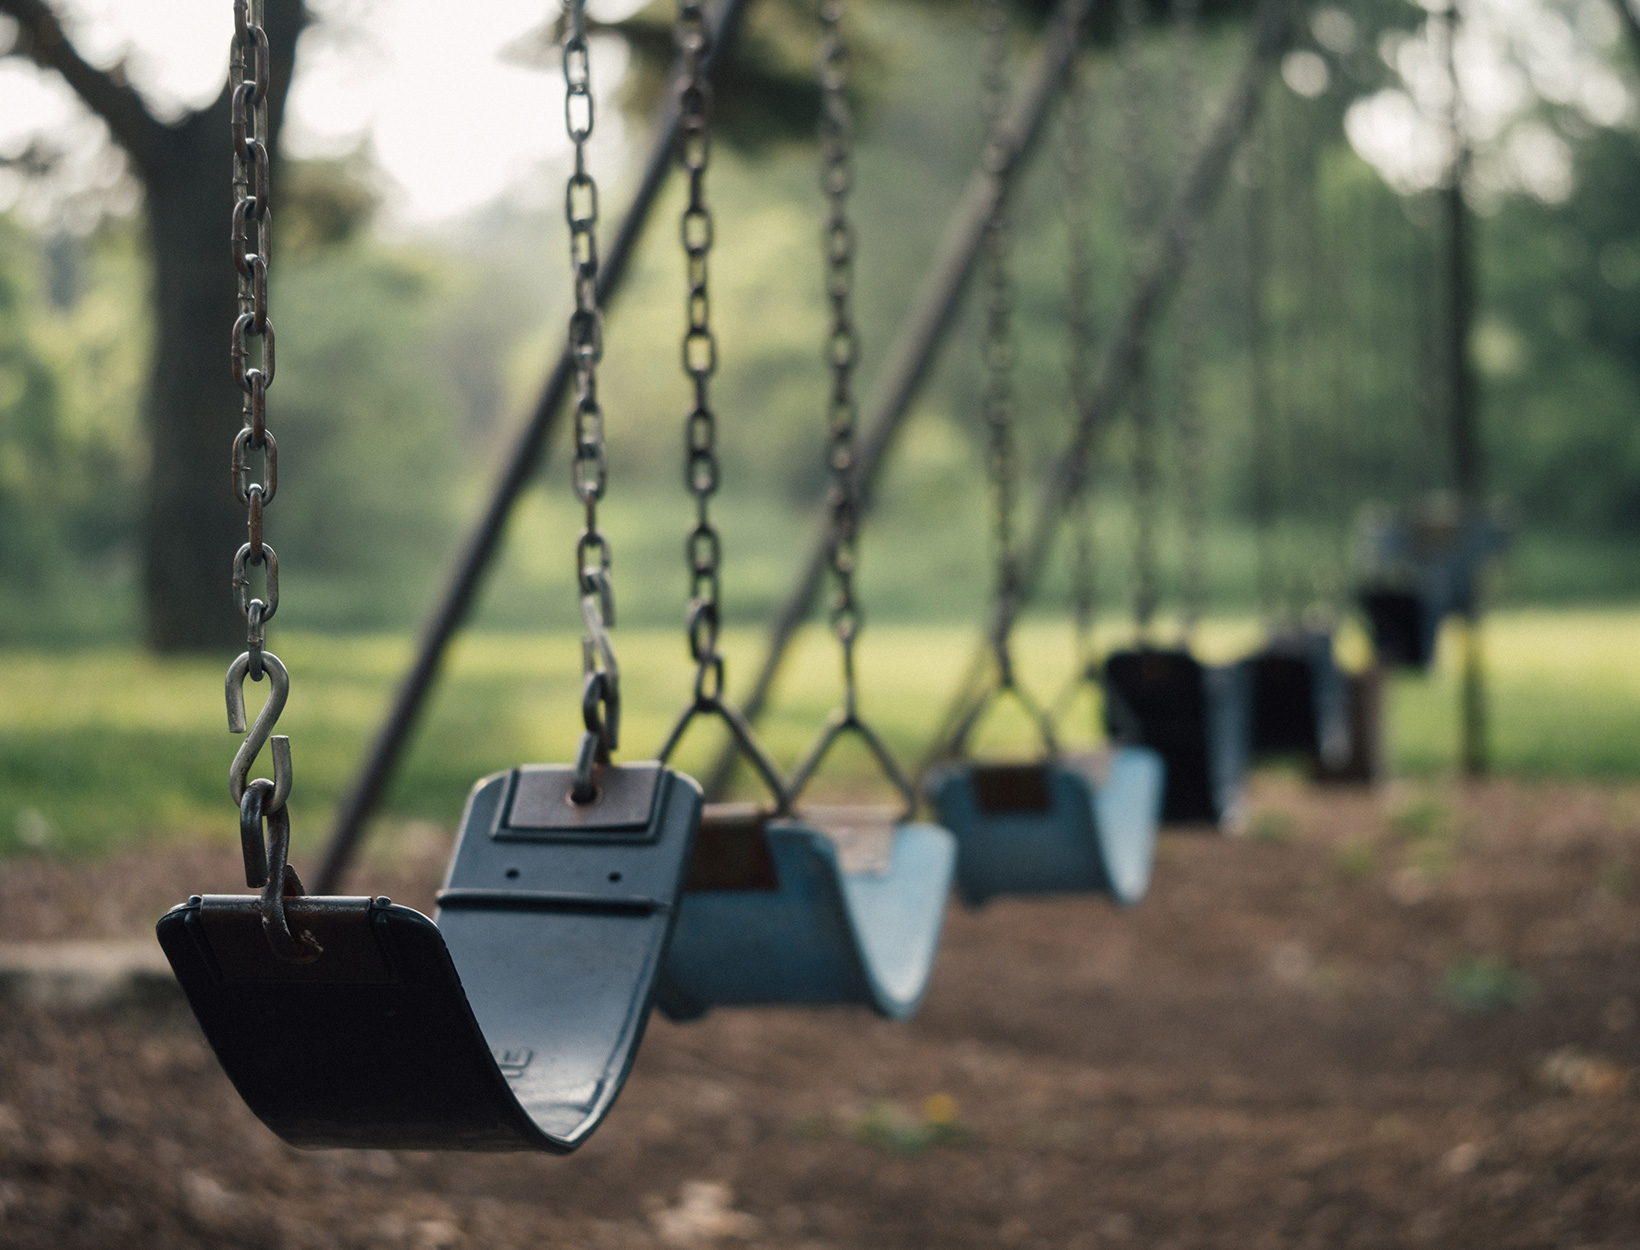 The Parasite on the Playground